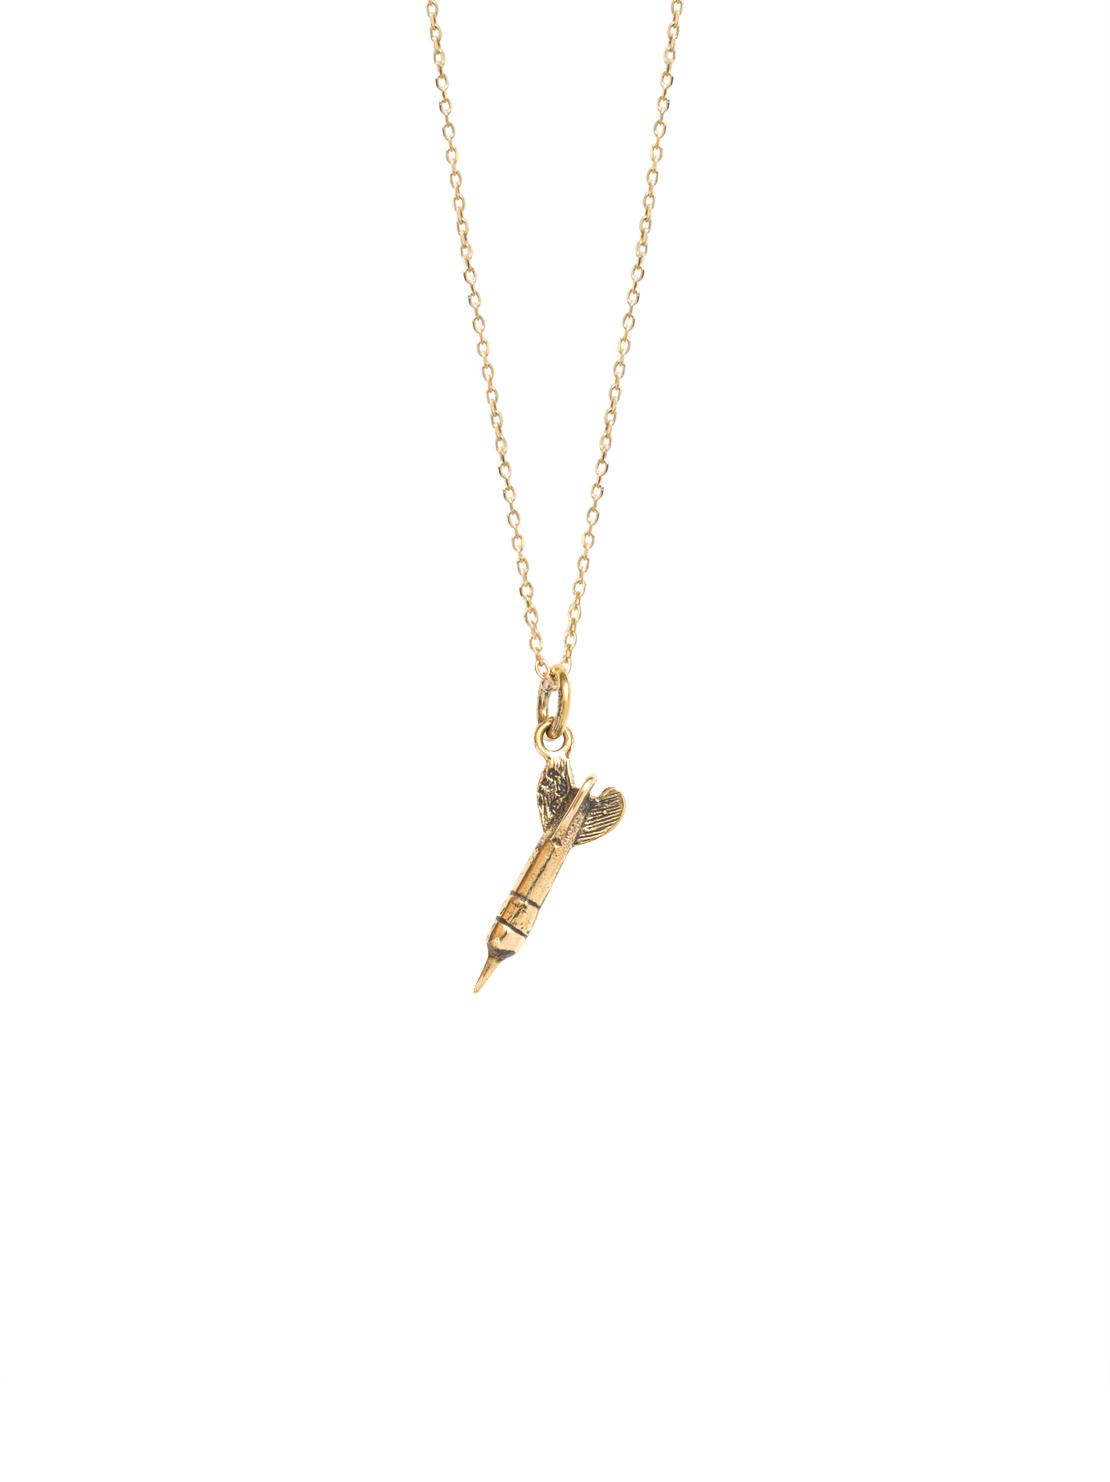 2e44f0c2a14 Dart Necklace - Tilly Sveaas Jewellery